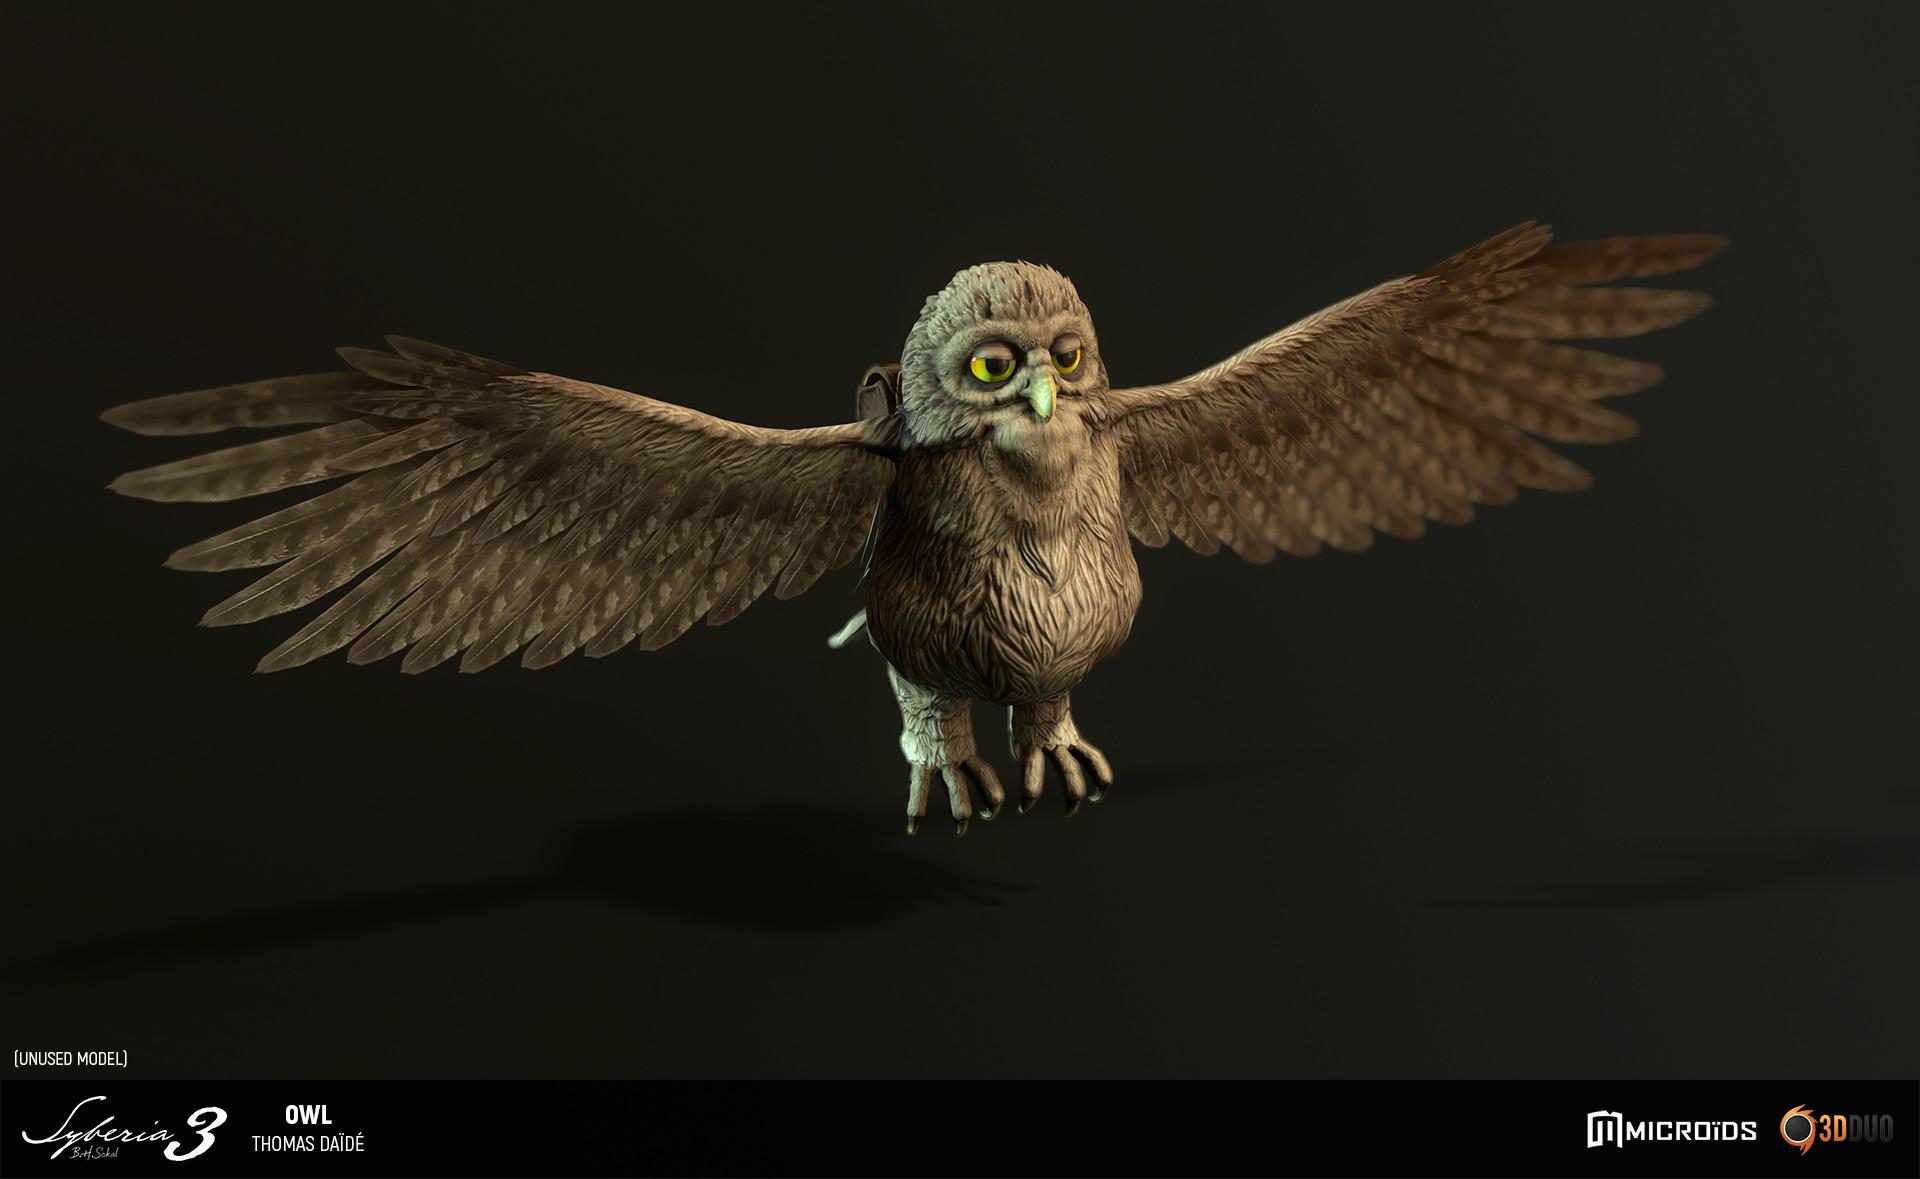 Thomas daide tdaide syb owl 06